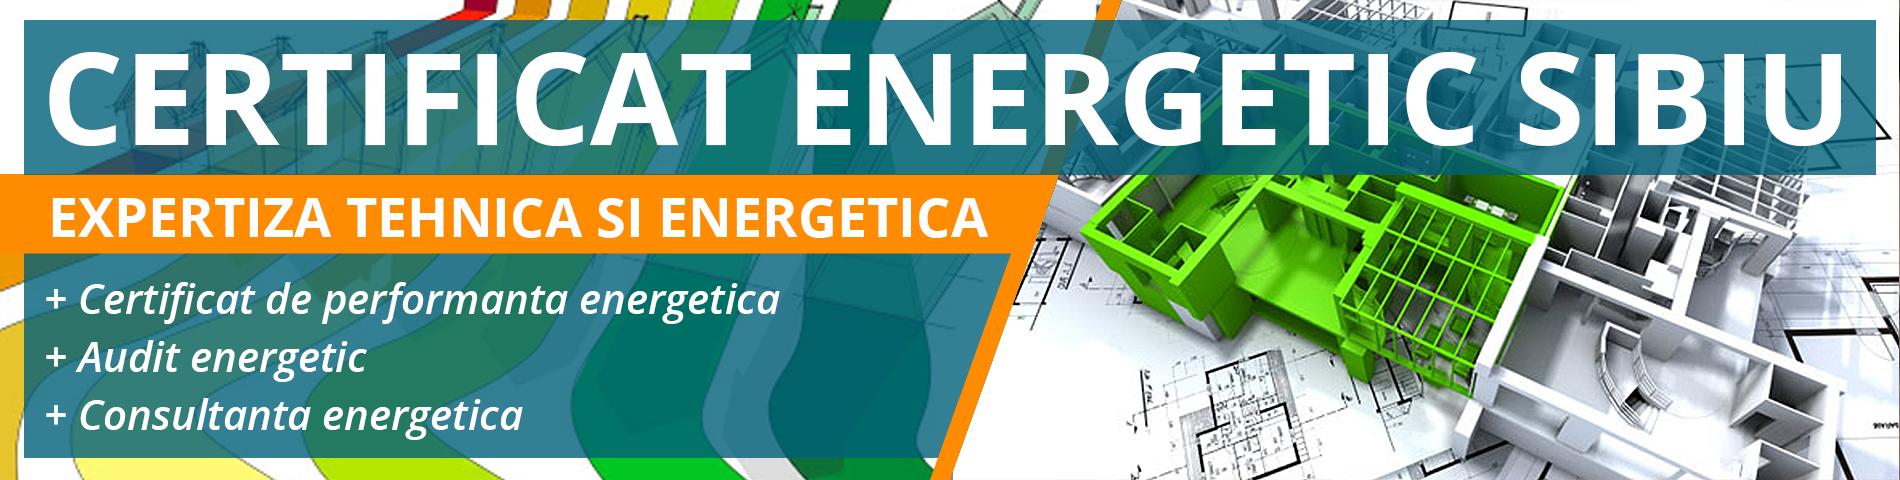 Certificat de Performanta Energetica Sibiu